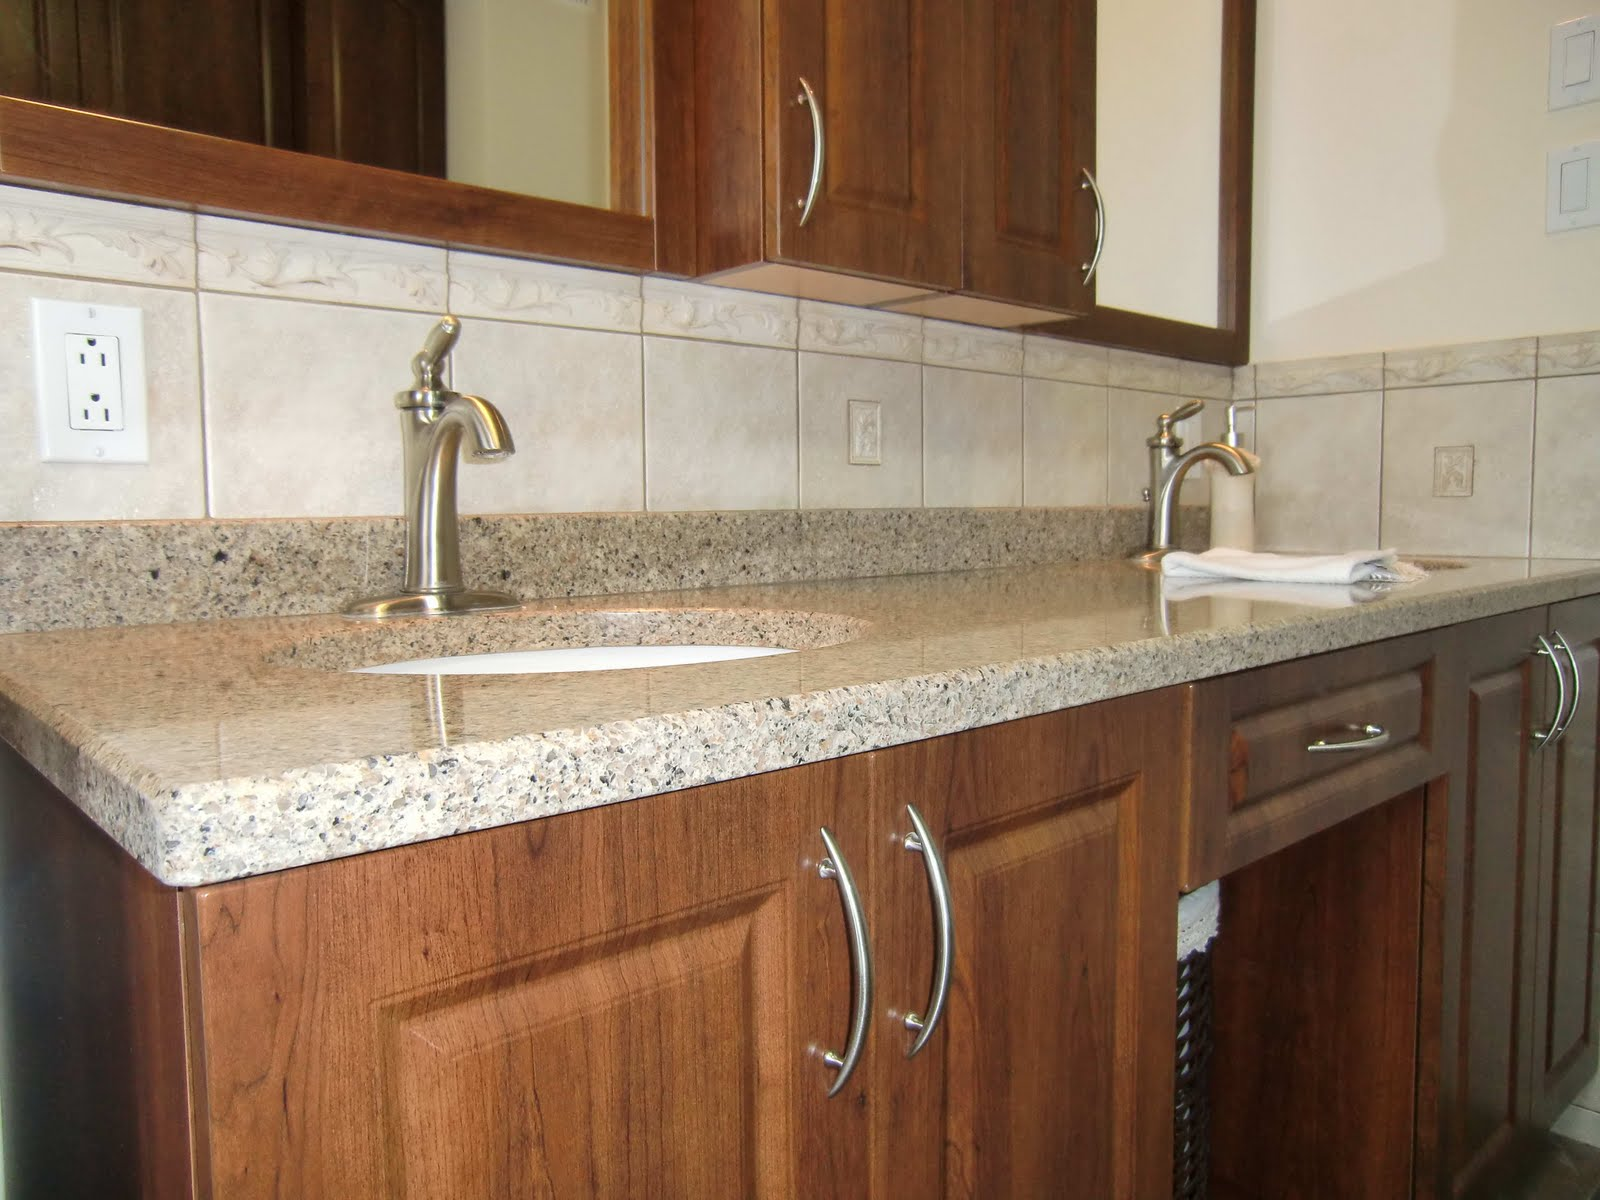 Specialit smm armoire de salle de bain en thermoplastique for Hauteur comptoir salle de bain